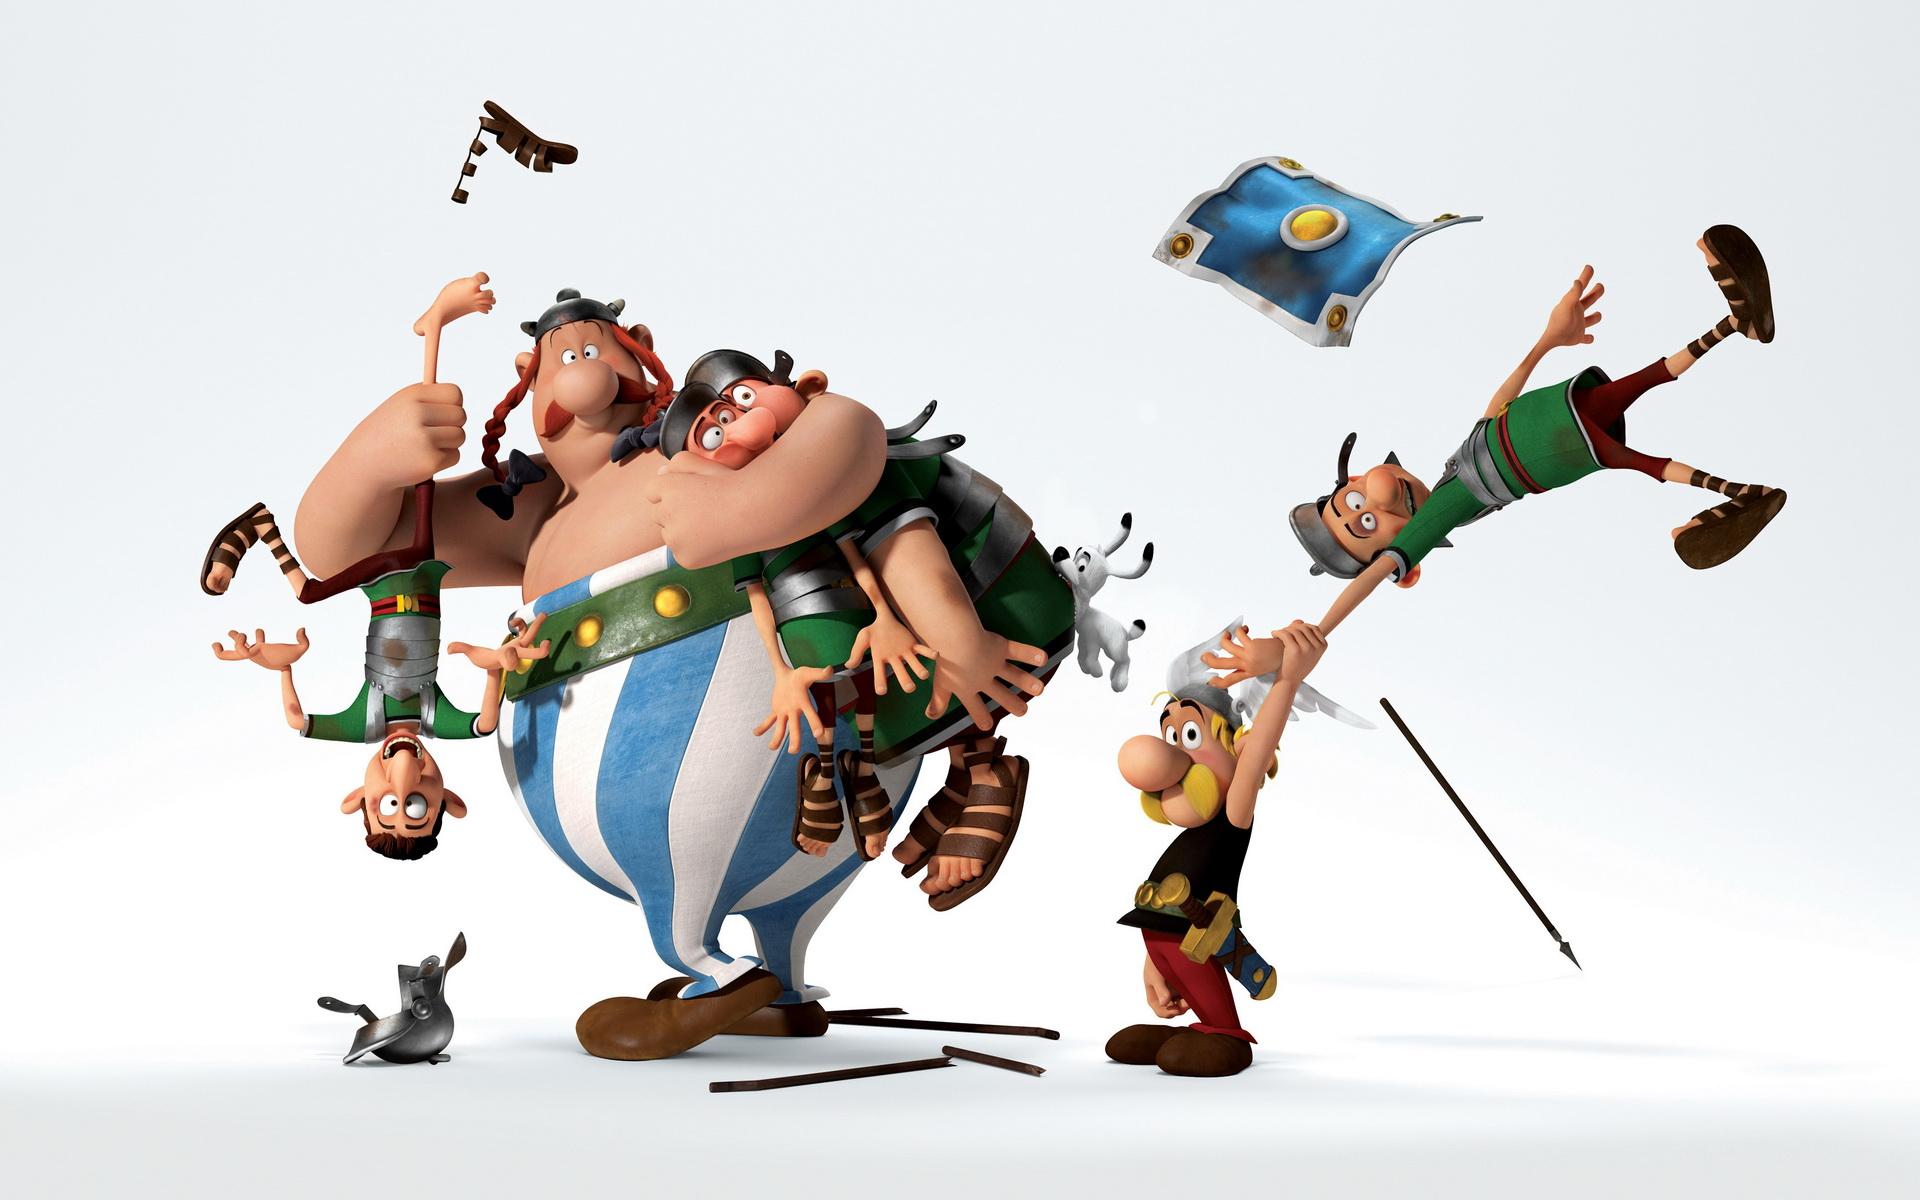 Fond D Ecran Illustration Dessin Anime Jouet 2015 Asterix